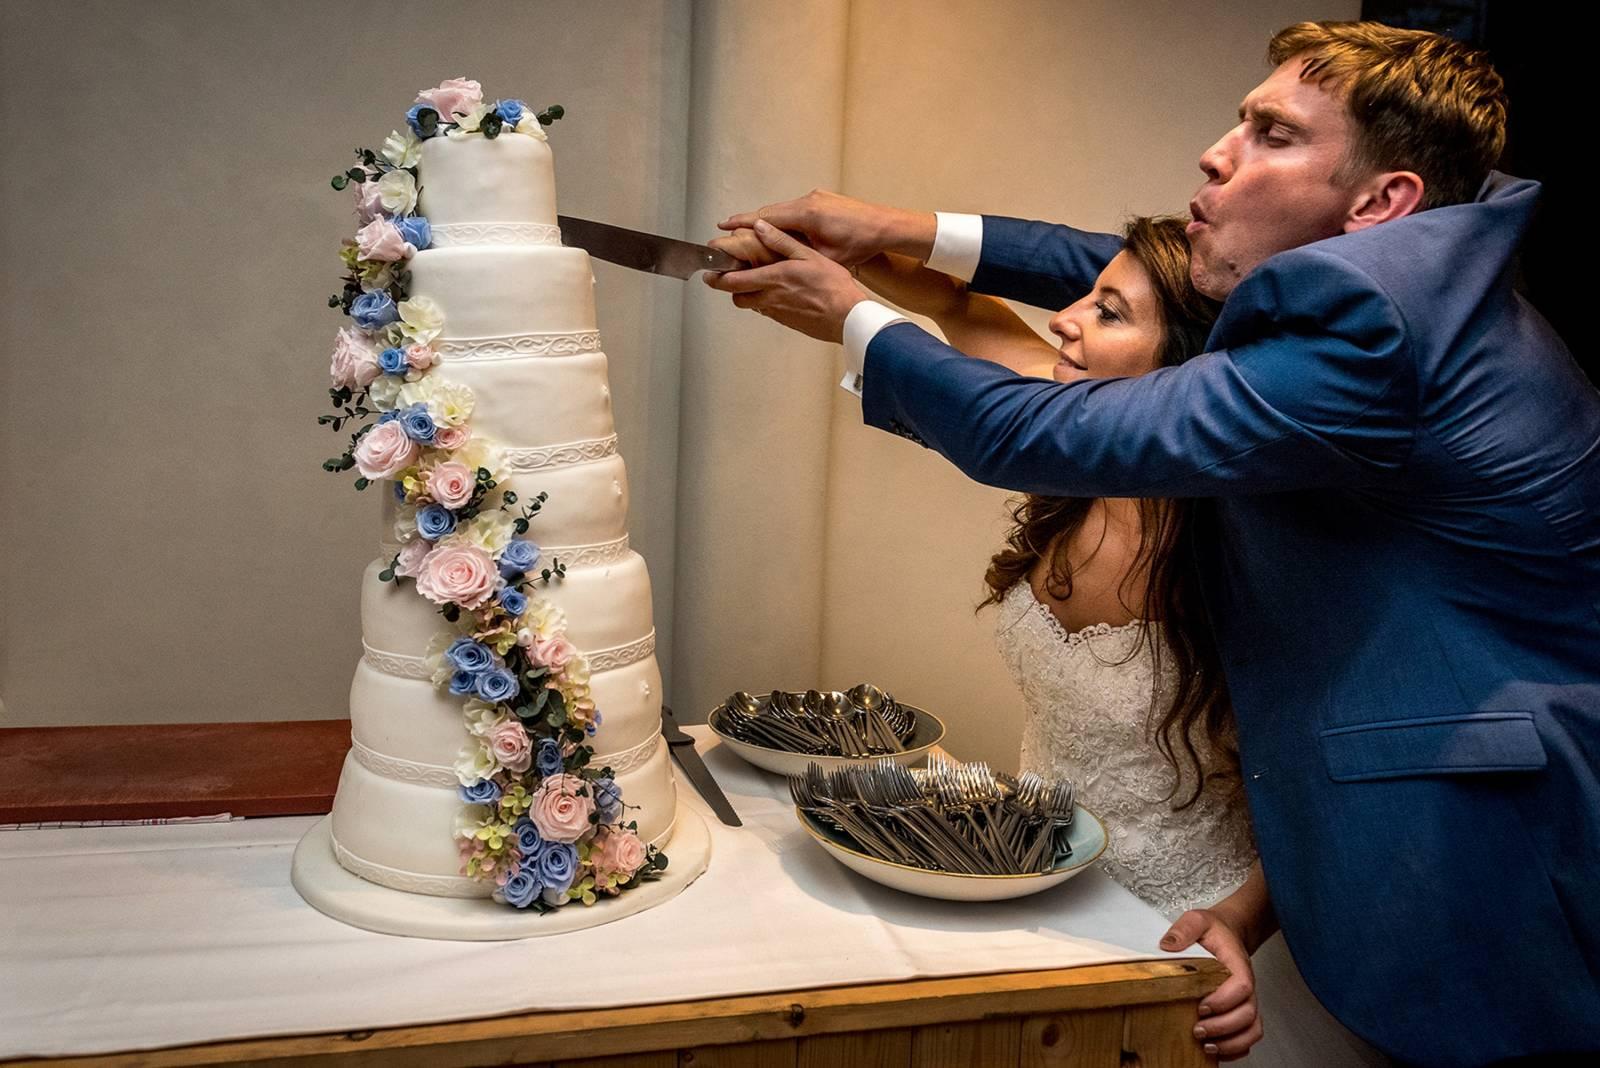 Fotografie Melody - Huwelijksfotograaf - Trouwfotograaf - House of Weddings - 2